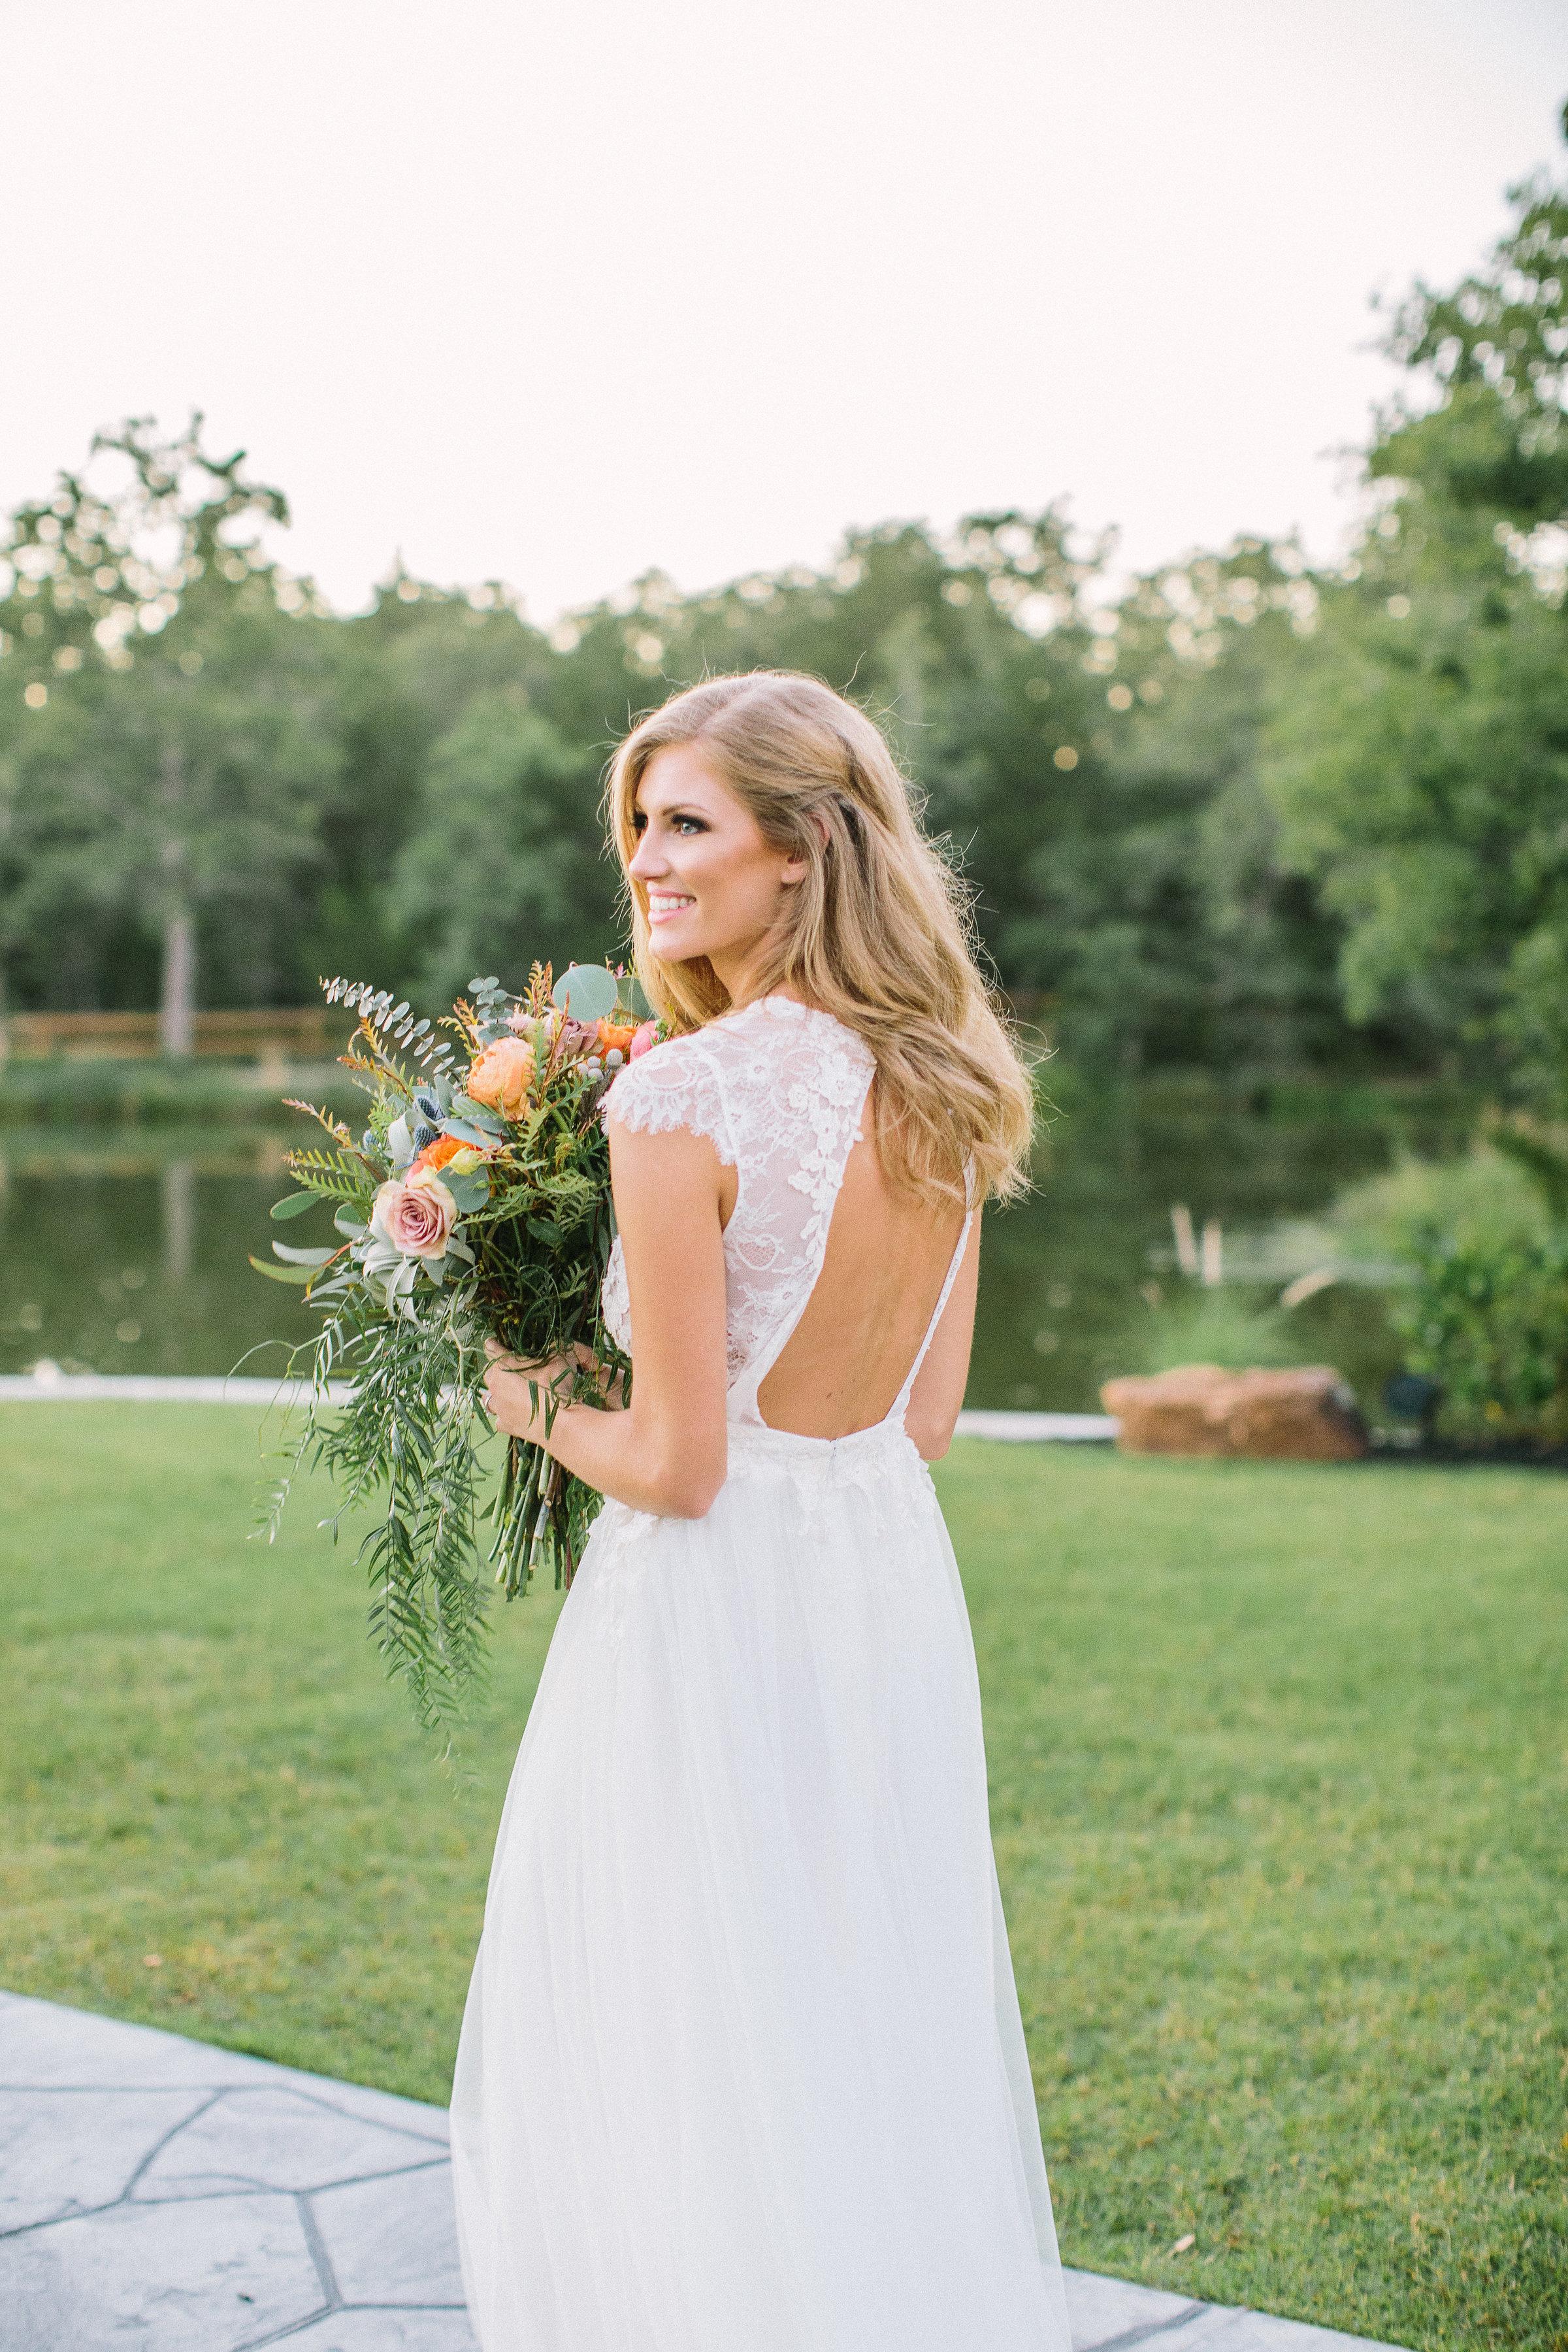 Ellen-Ashton-Photography-Peach-Creek-Ranch-Weddings-Wed-and-Prosper389